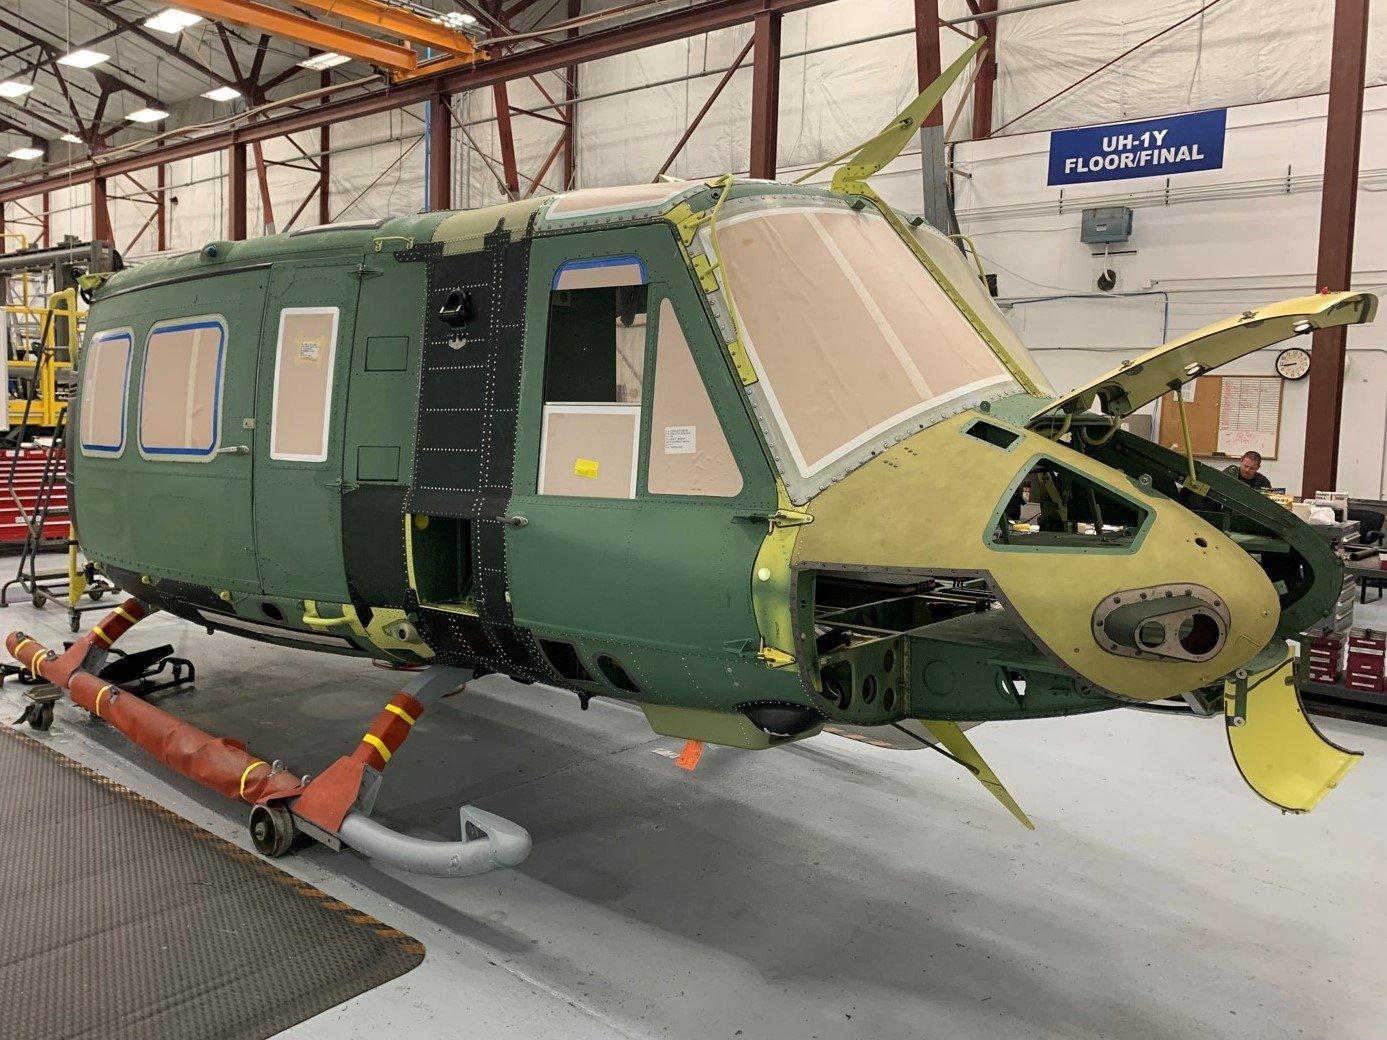 1st UH-1Y Venom cabin for Czech Republic 19-07-21 [Bell]